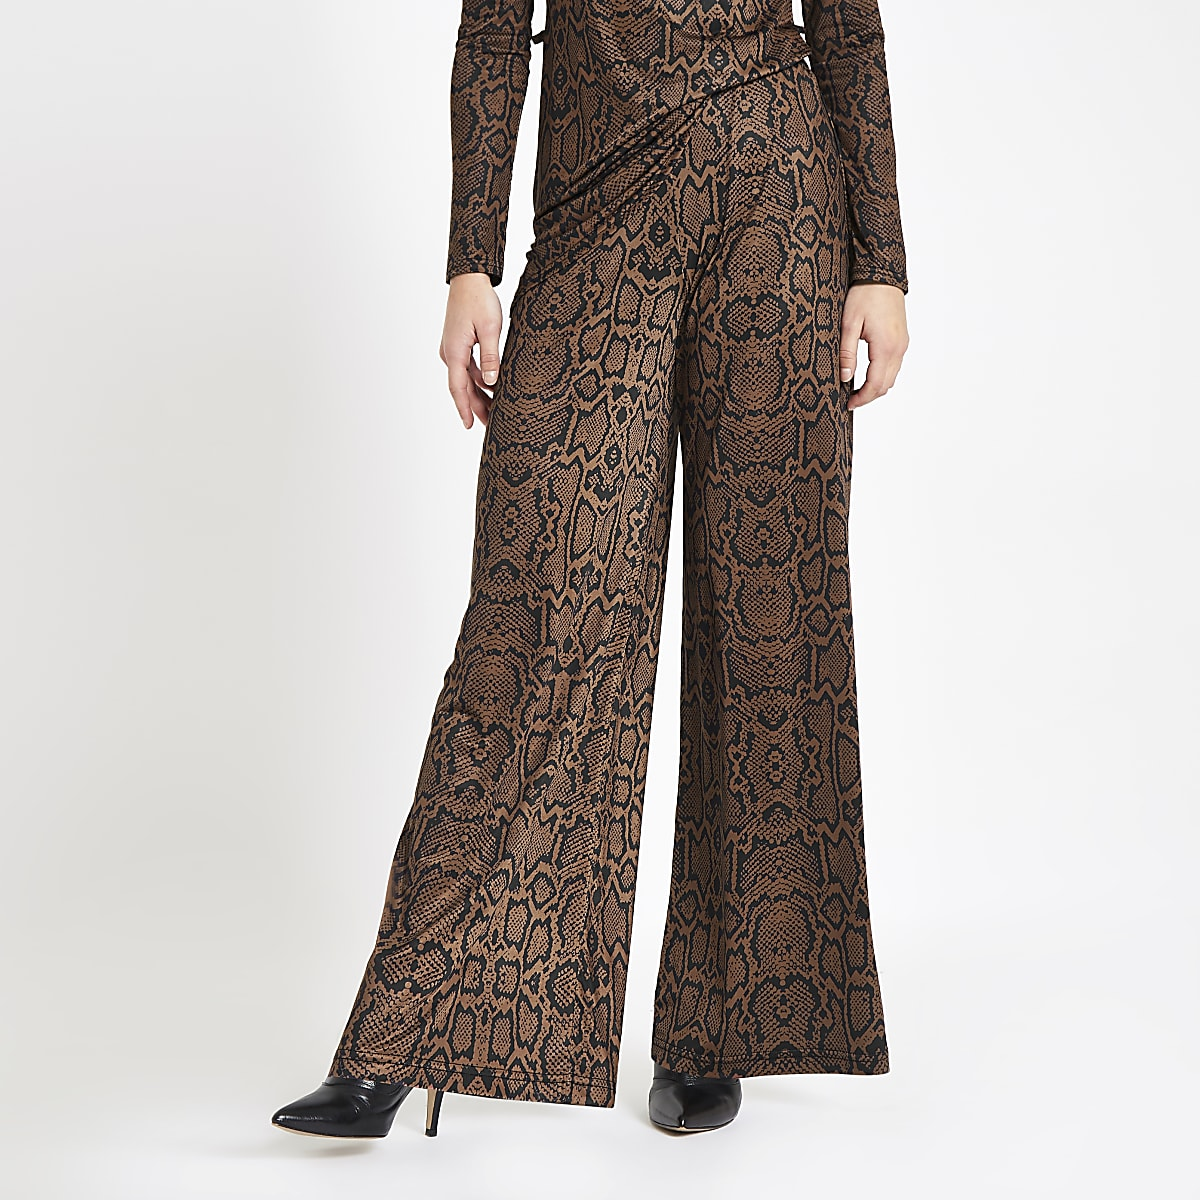 Petite brown snake print wide leg pants